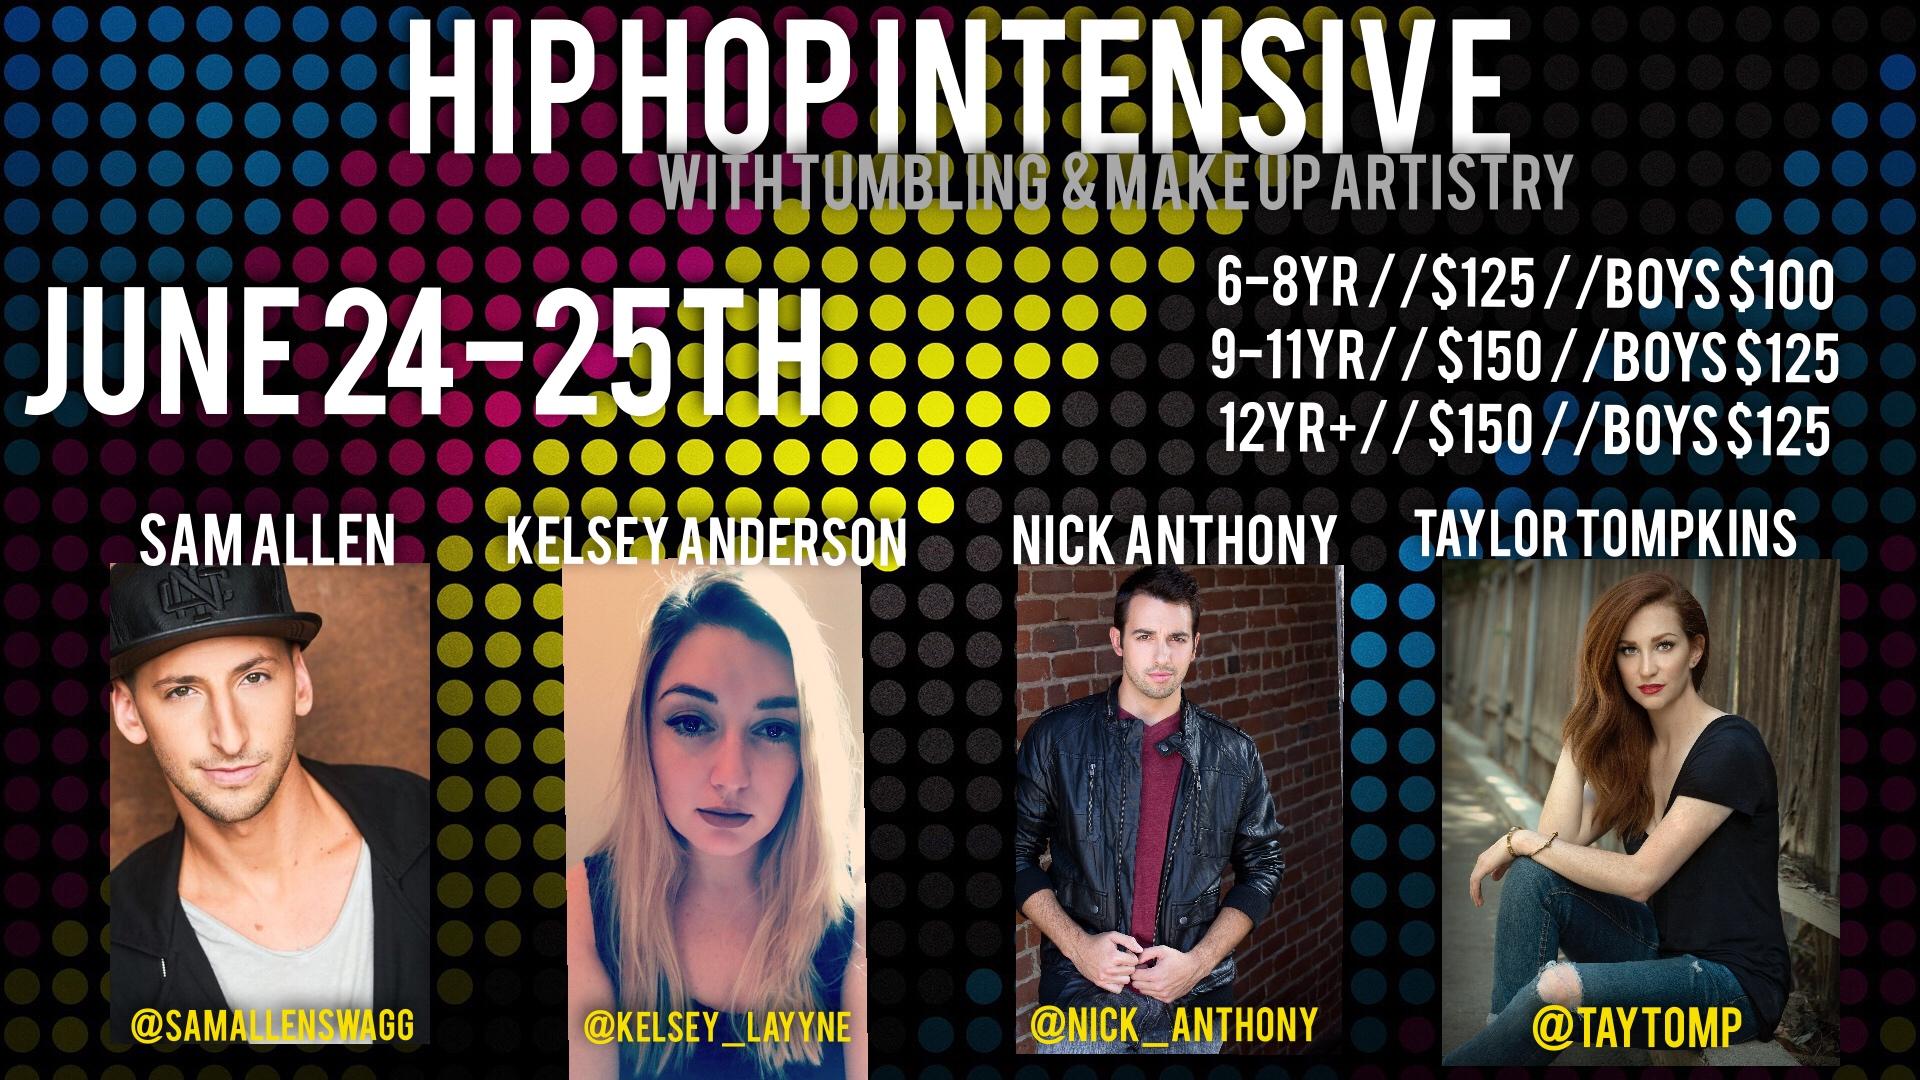 Hip Hop Intensive June 24-25th